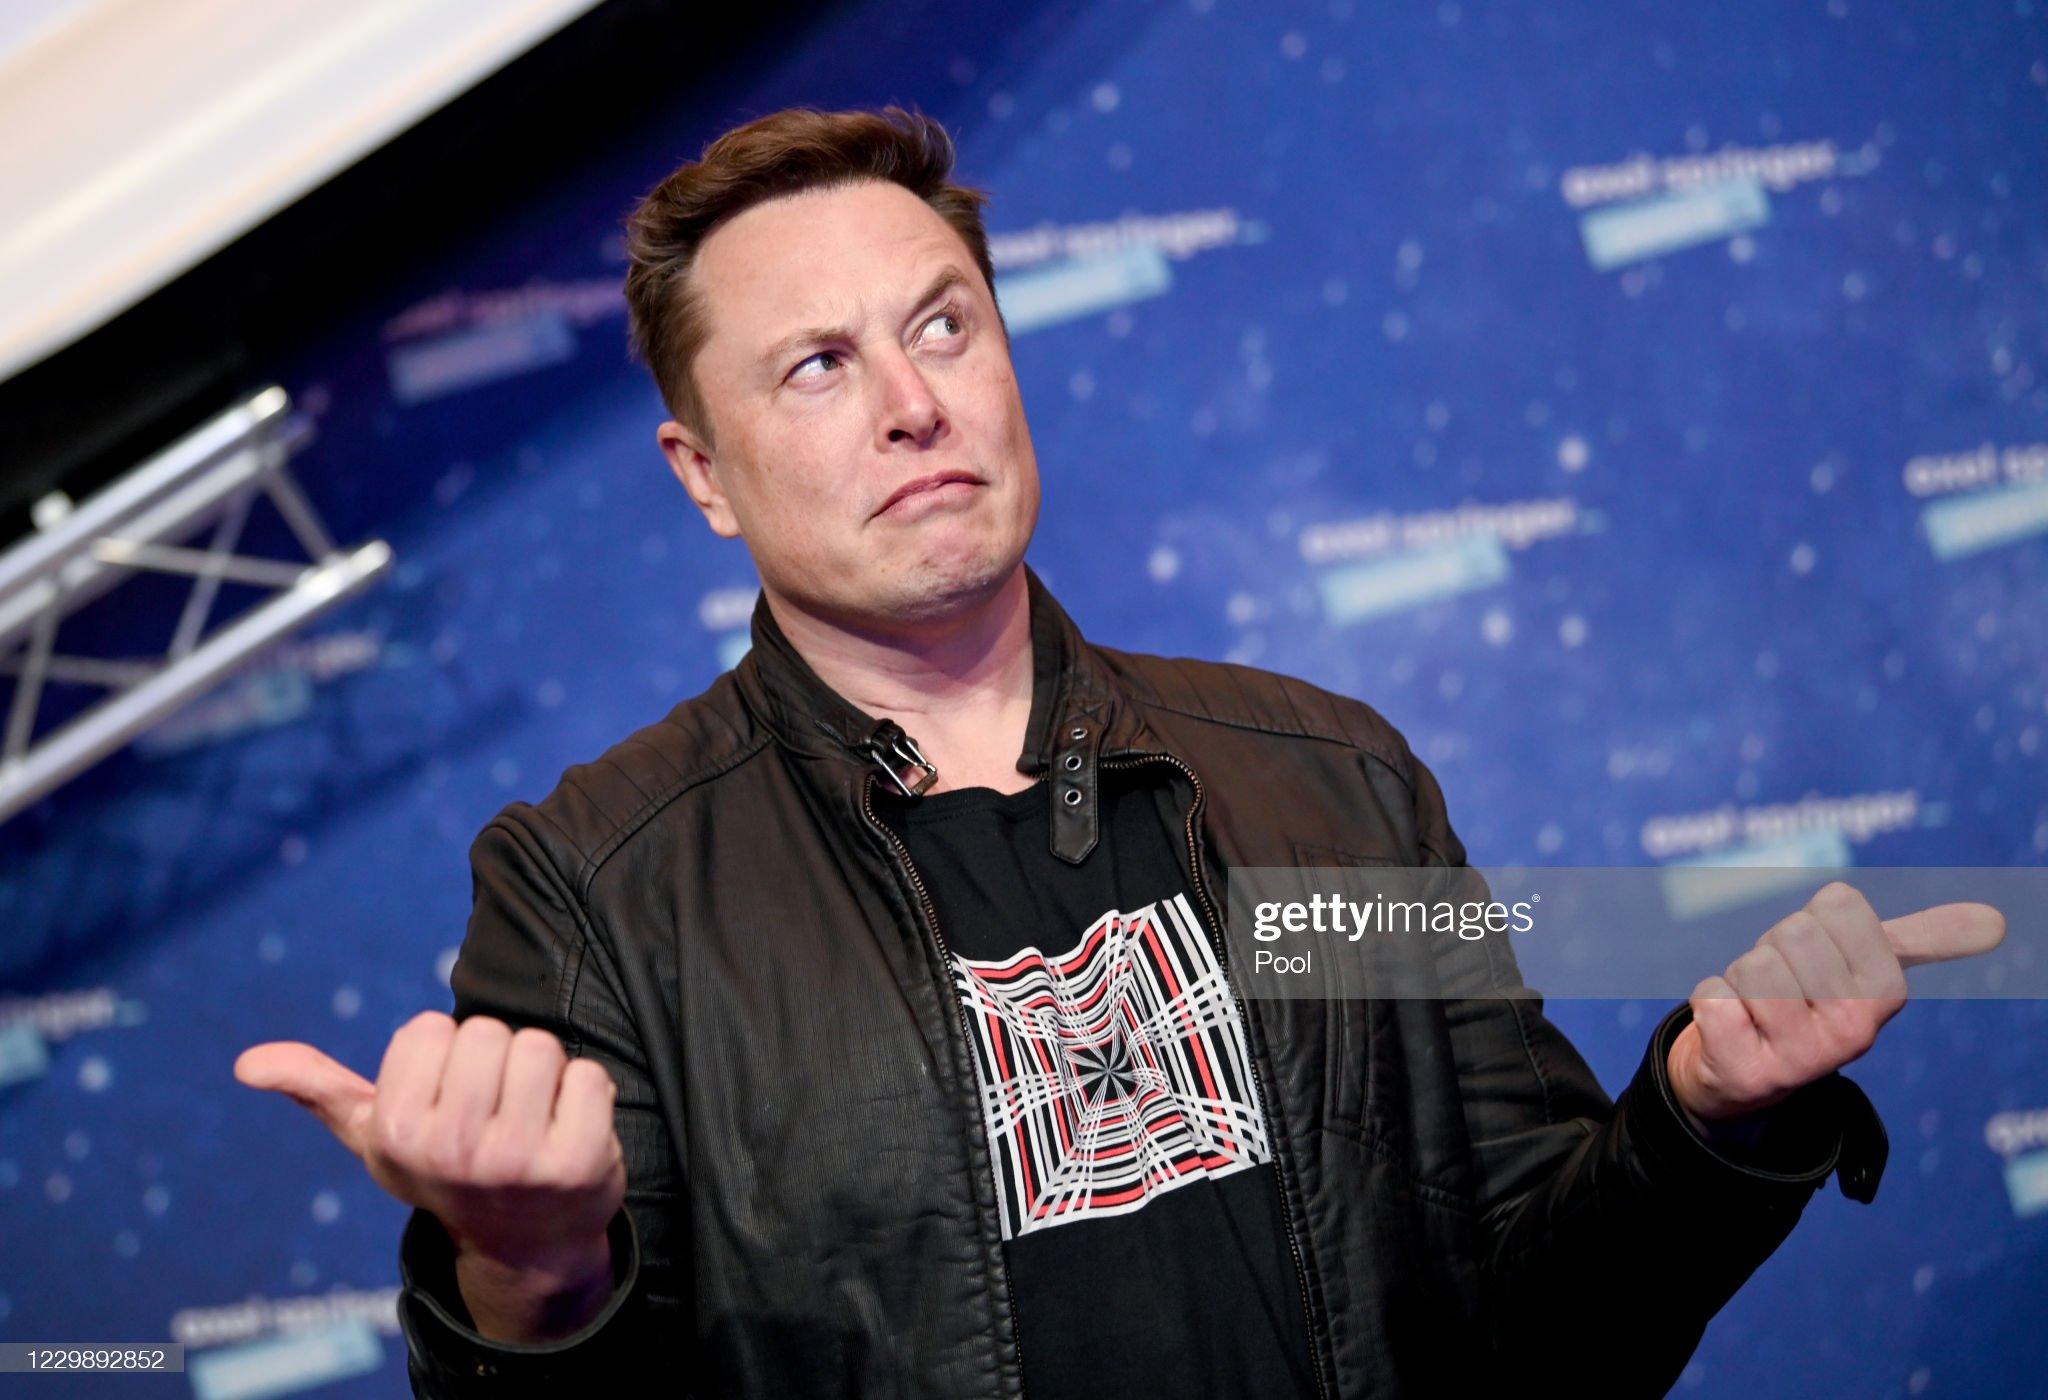 Elon Musk Awarded With Axel Springer Award In Berlin : News Photo